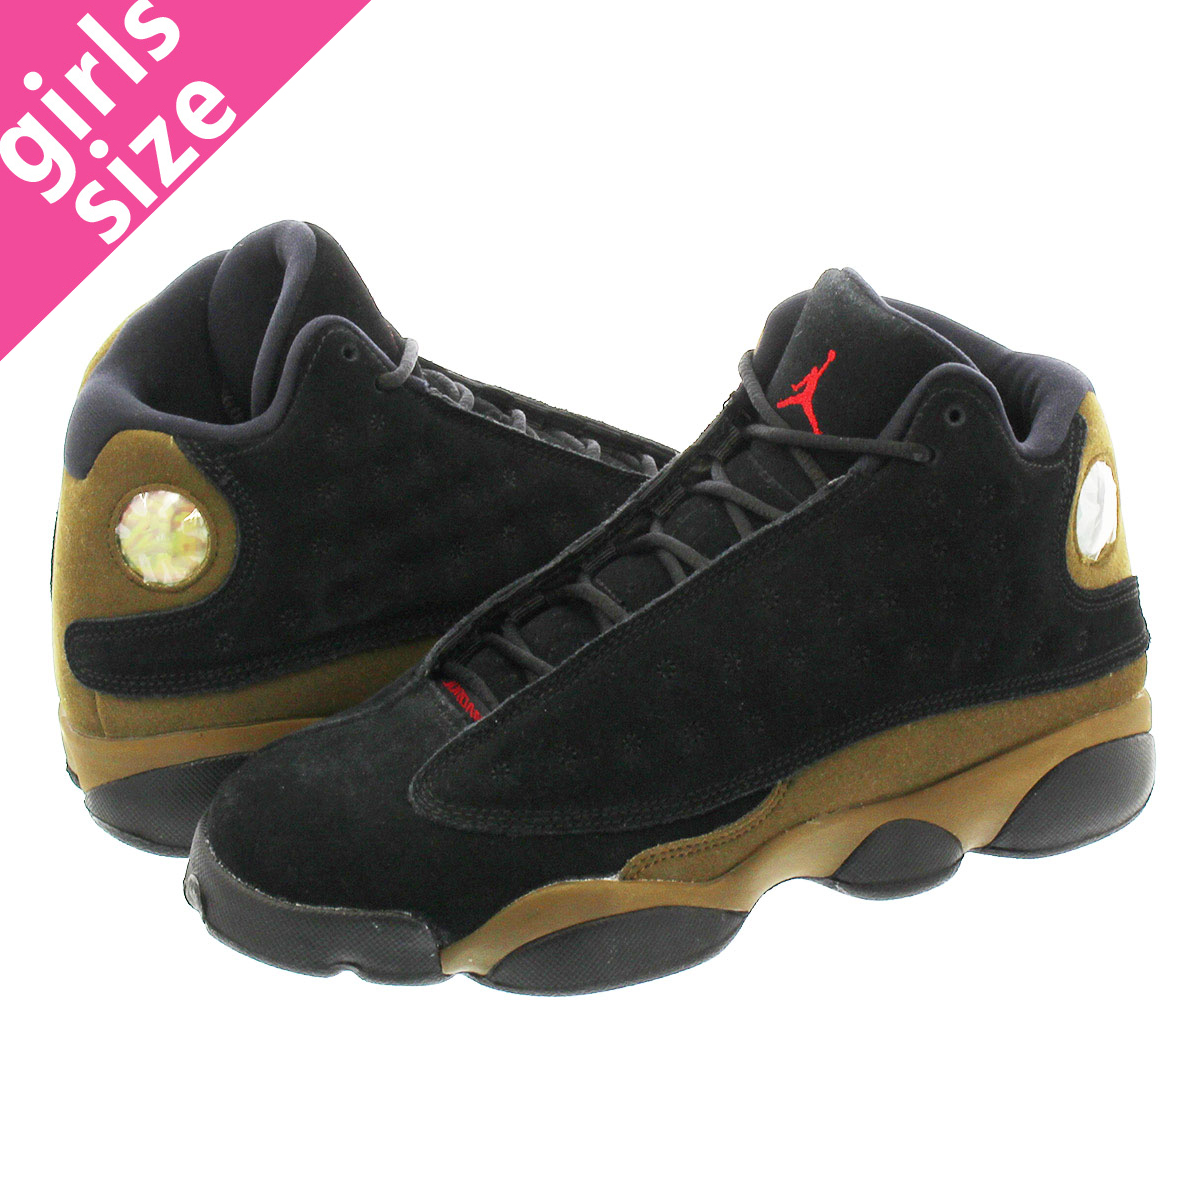 timeless design 07a01 090f0 NIKE AIR JORDAN 13 RETRO BG Nike Air Jordan 13 nostalgic BLACK TEAM  RED OLIVE 884,129-006